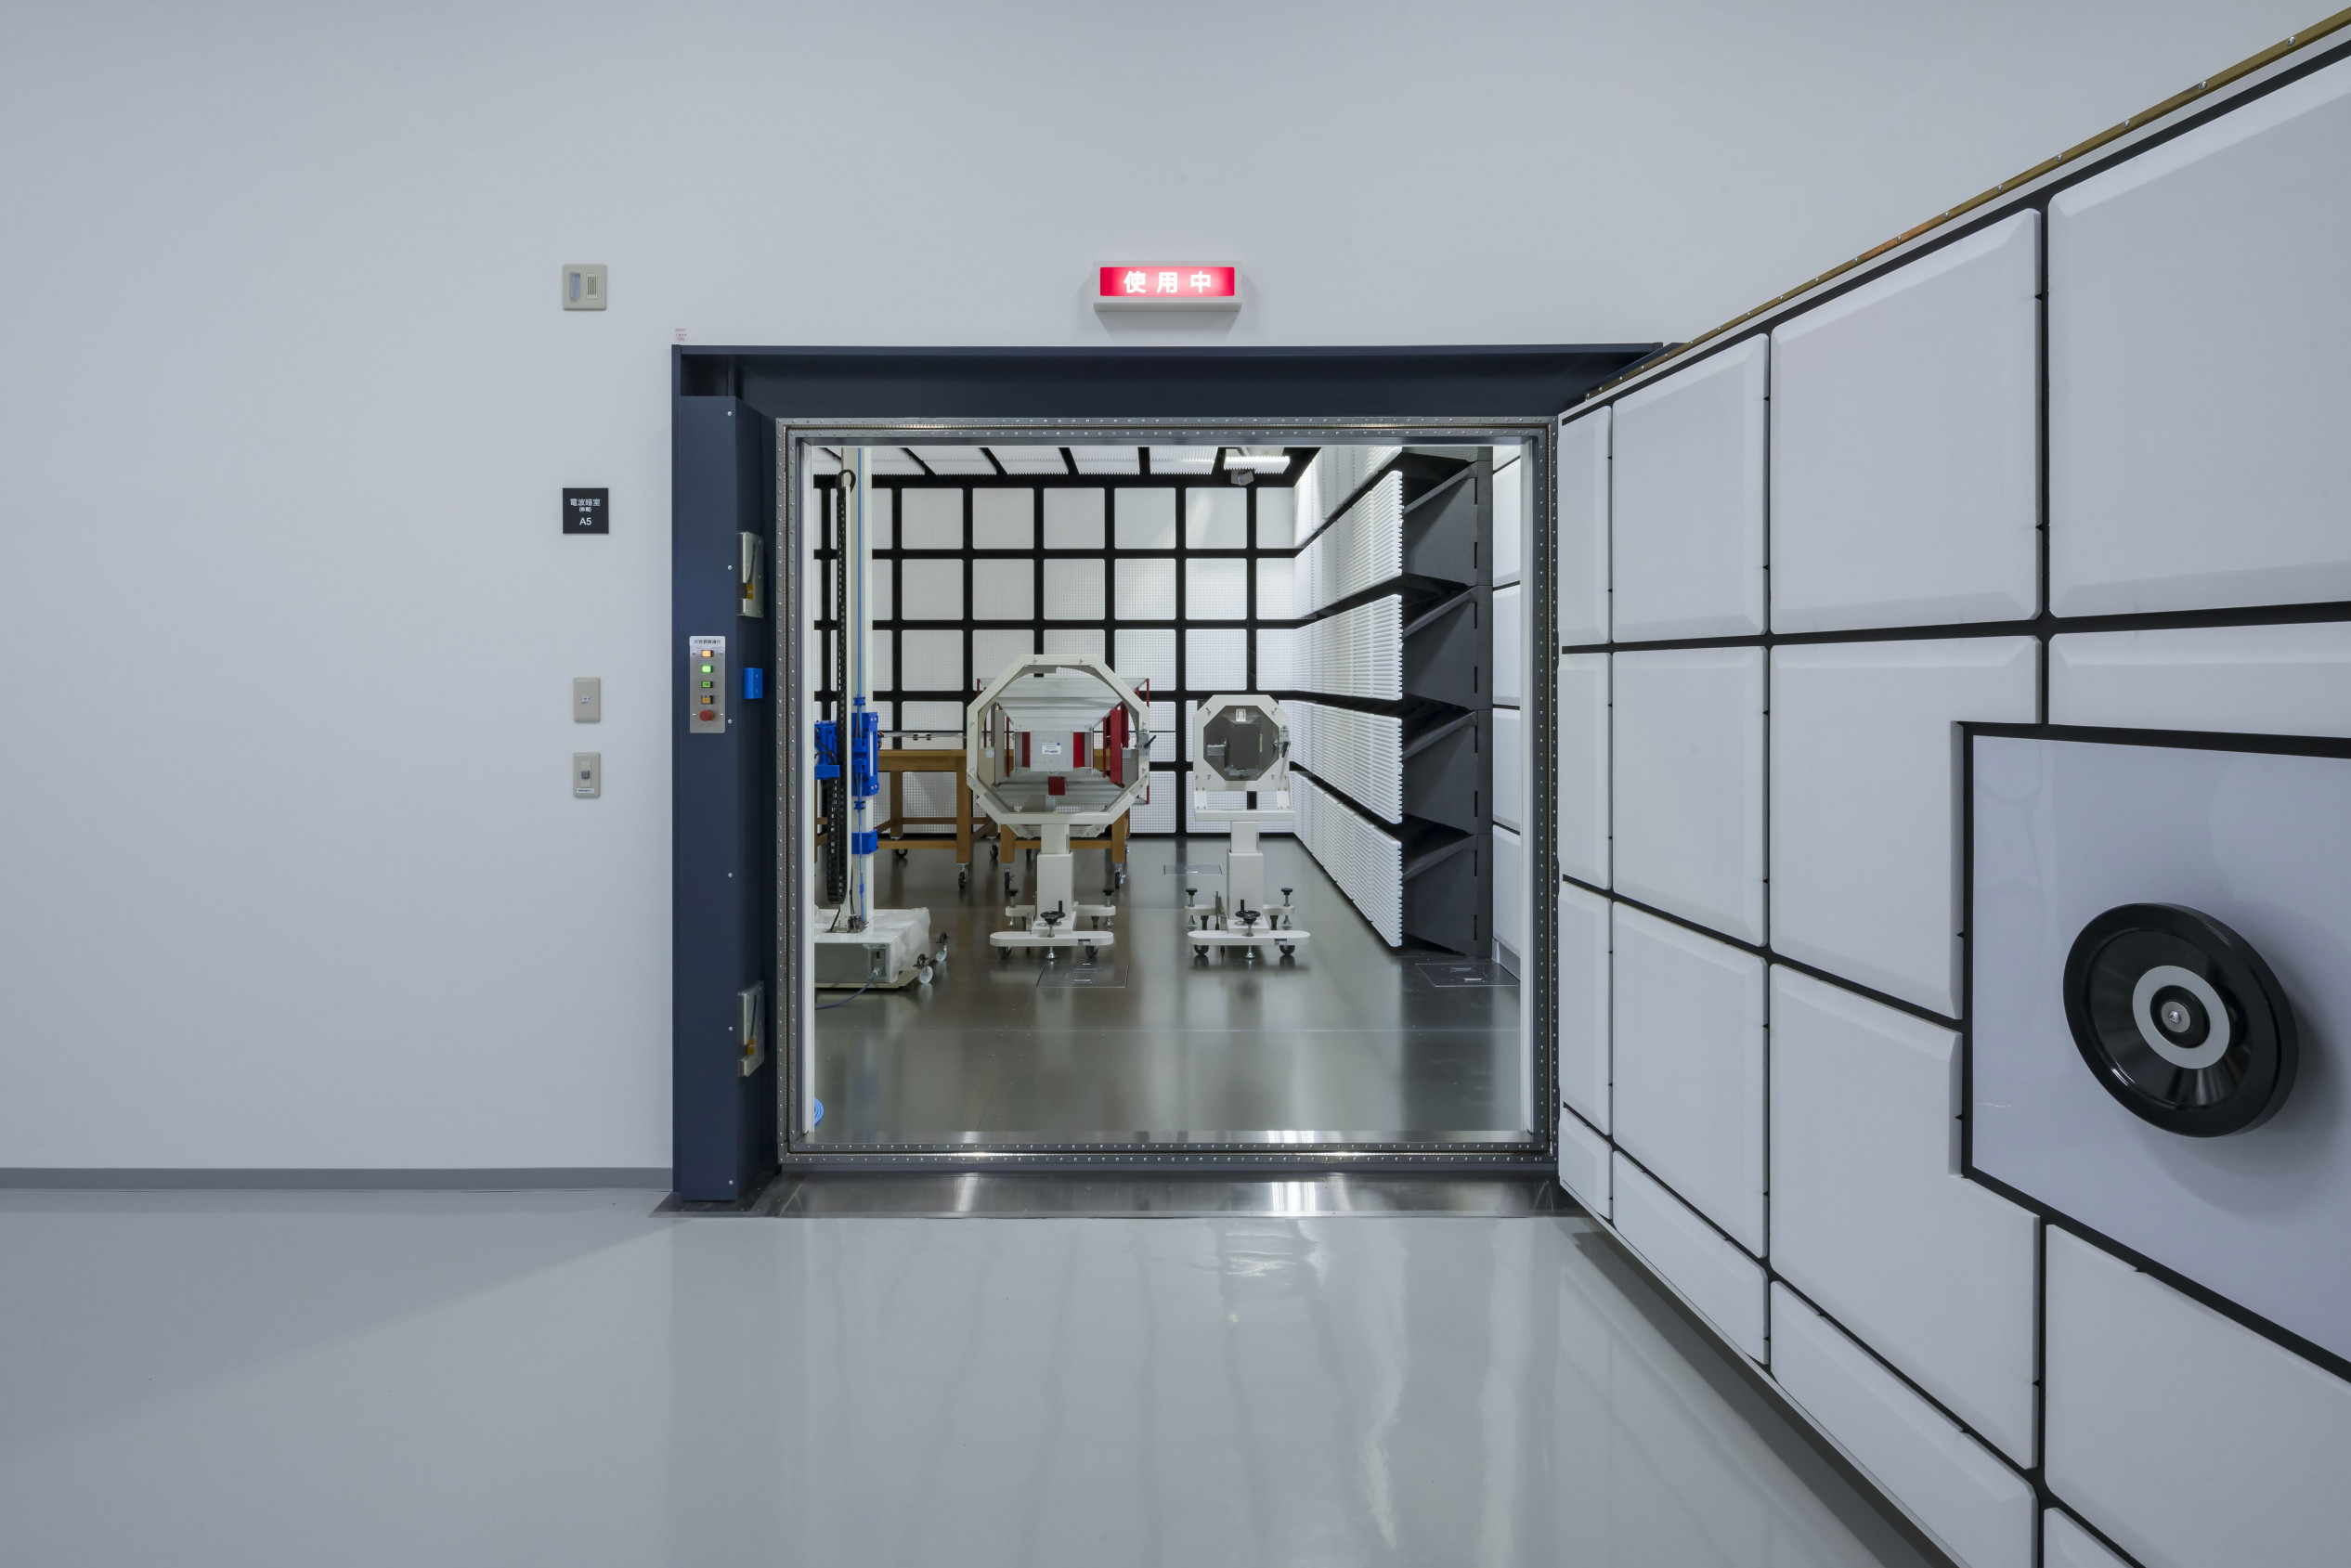 JQA彩都電磁環境試験所電波暗室棟別棟増築工事